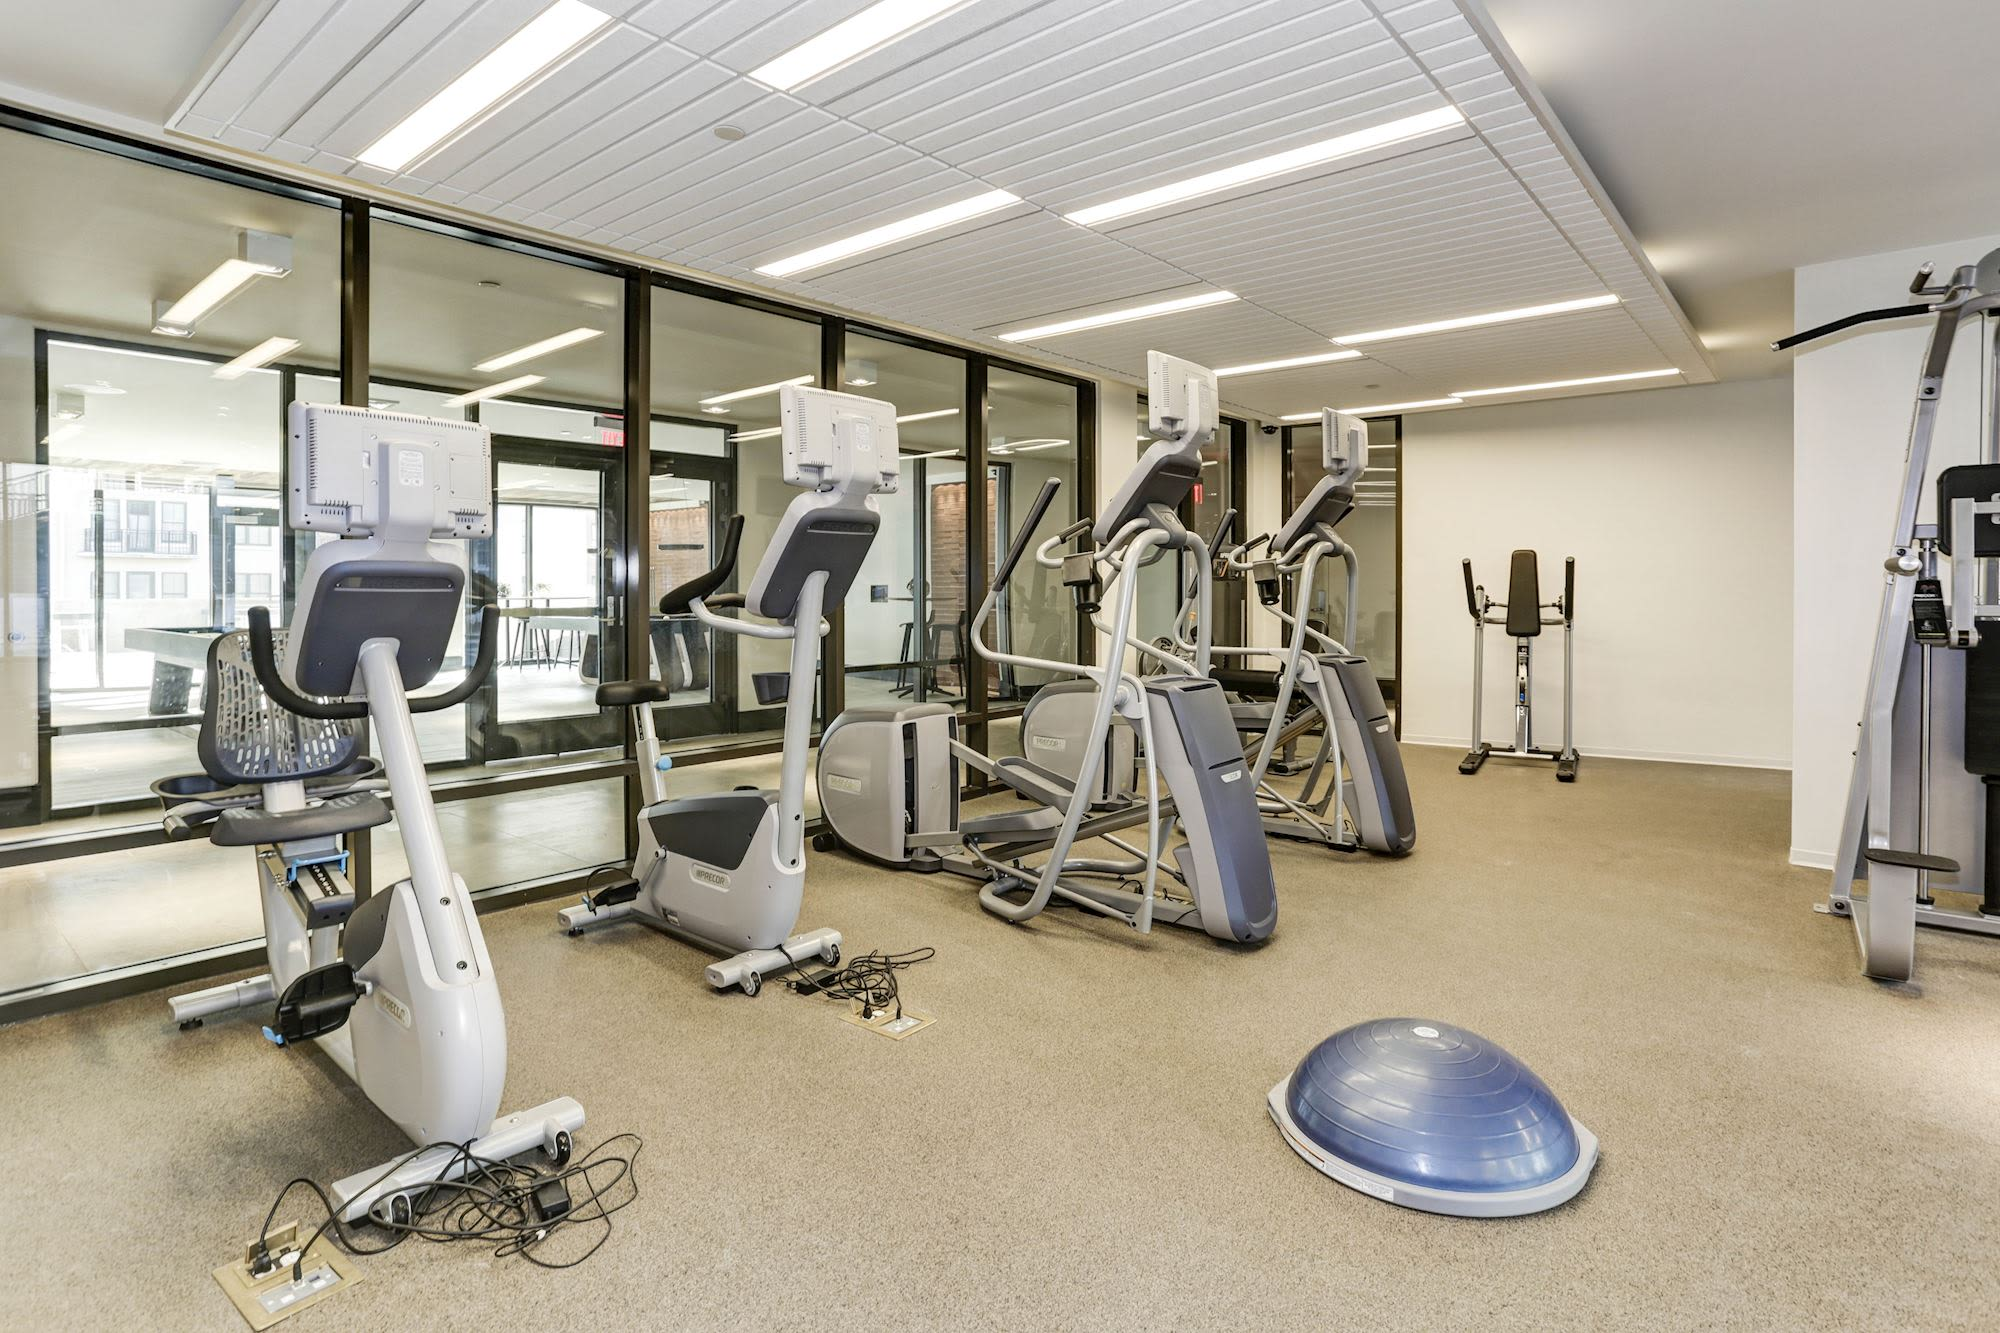 Fitness center at Metropolitan Rockville Town Center in Rockville, Maryland